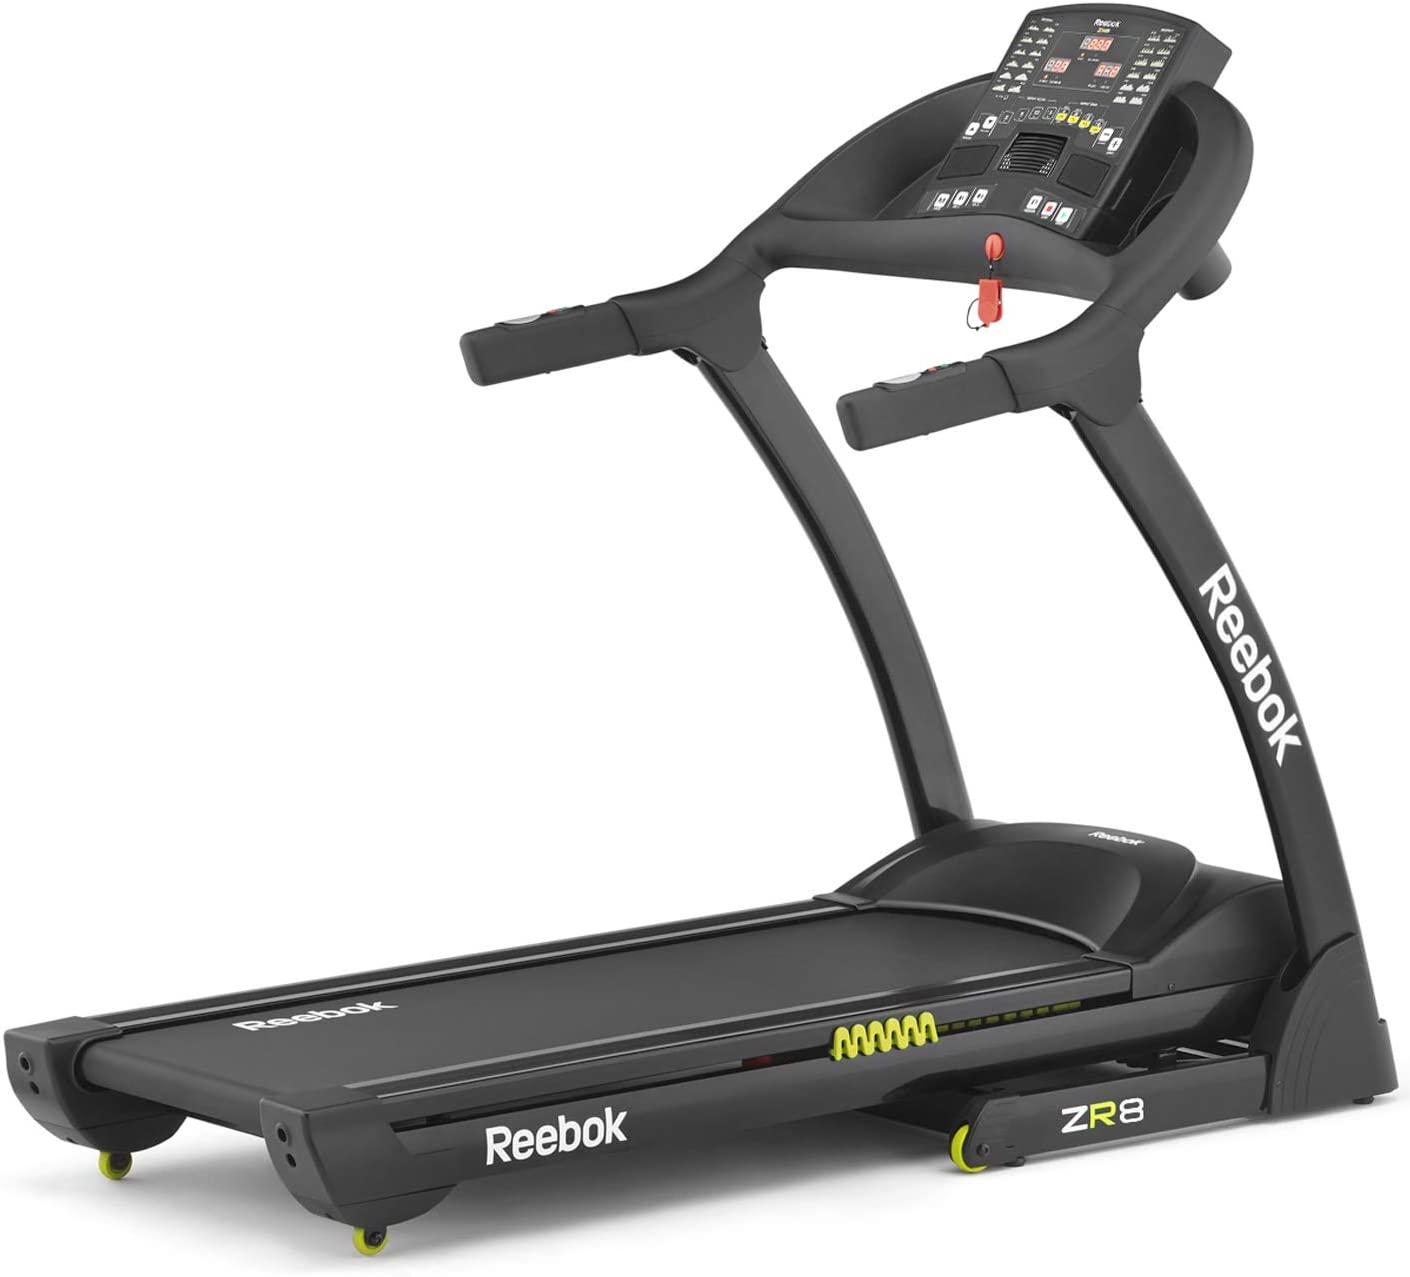 Reebok ZR8 Treadmill - £414.37 @ Amazon